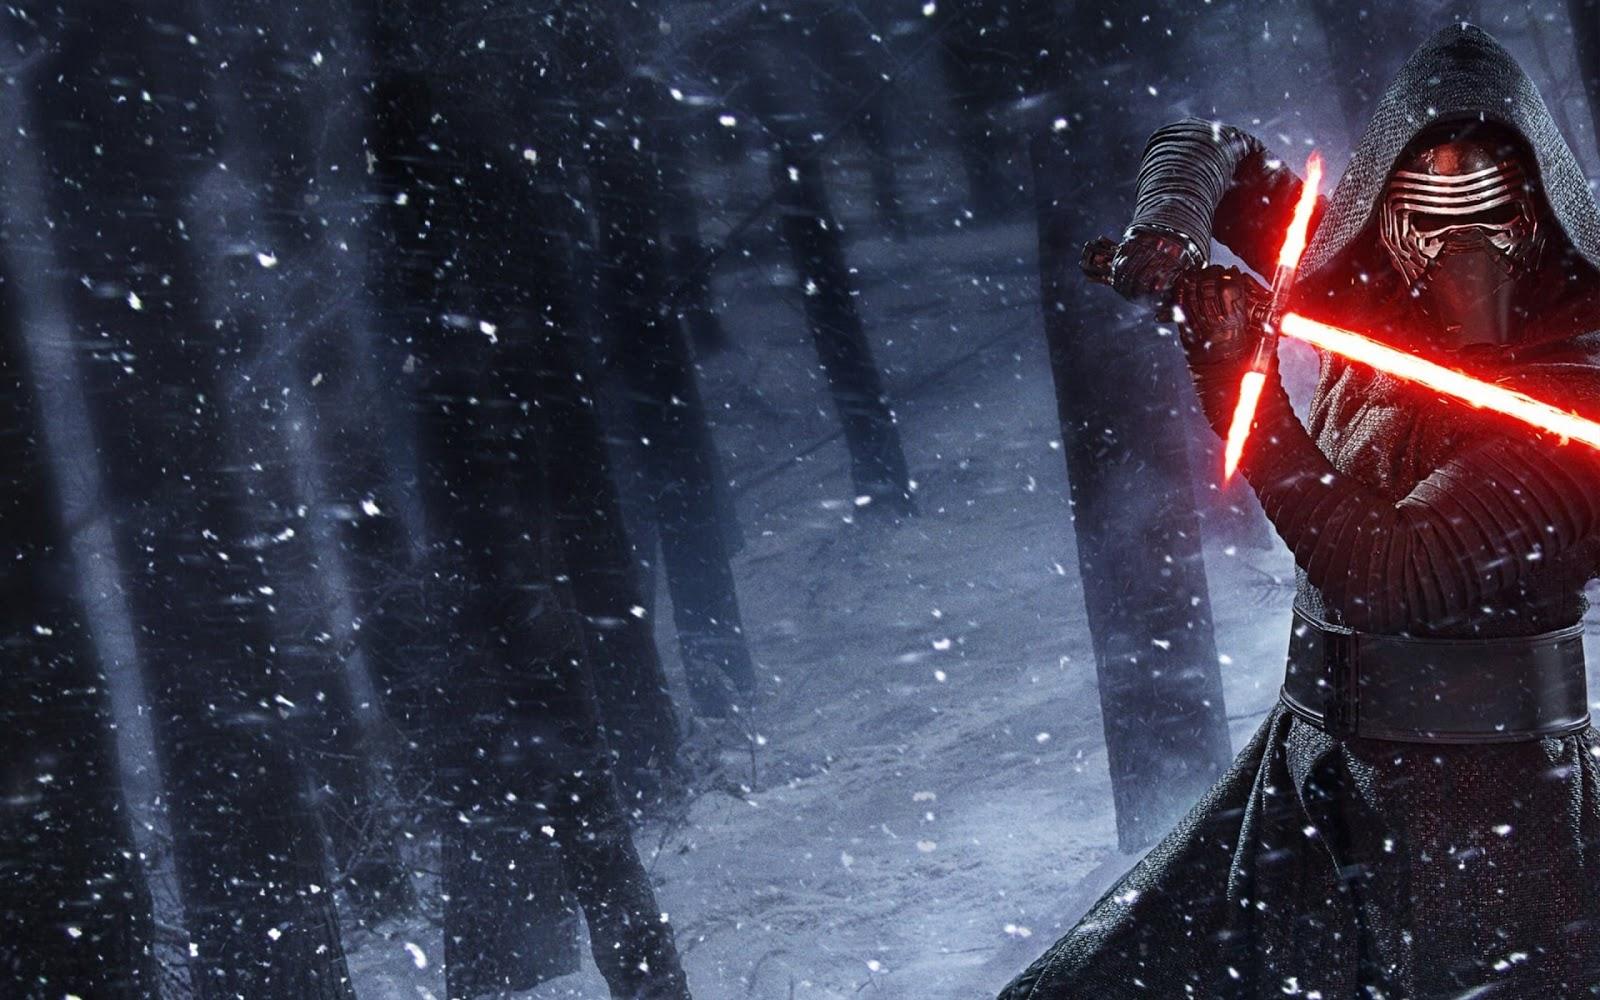 star wars episode vii the force awakens full hd wallpapers #starwars